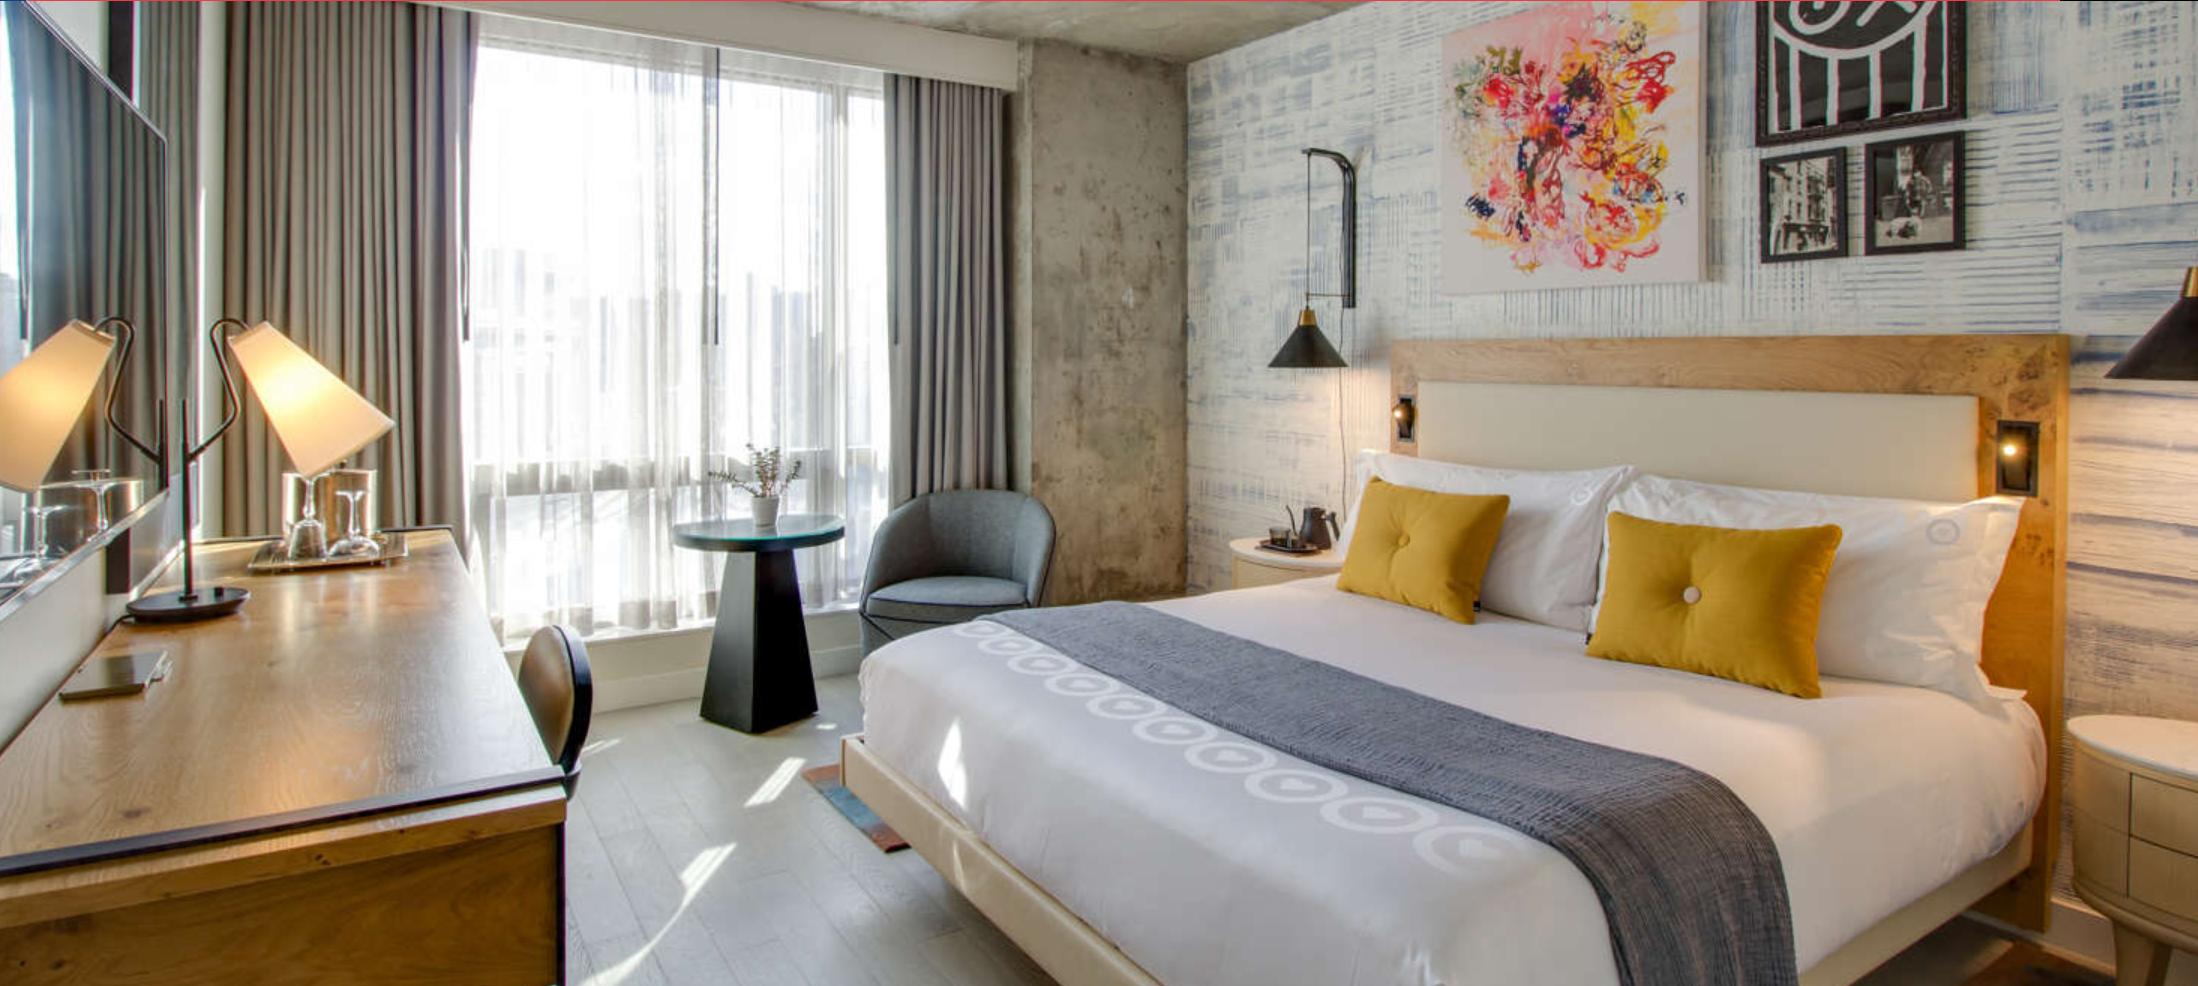 https://www.hotelsbyday.com/_data/default-hotel_image/4/21940/screenshot-2020-09-20-at-5-56-54-pm.png